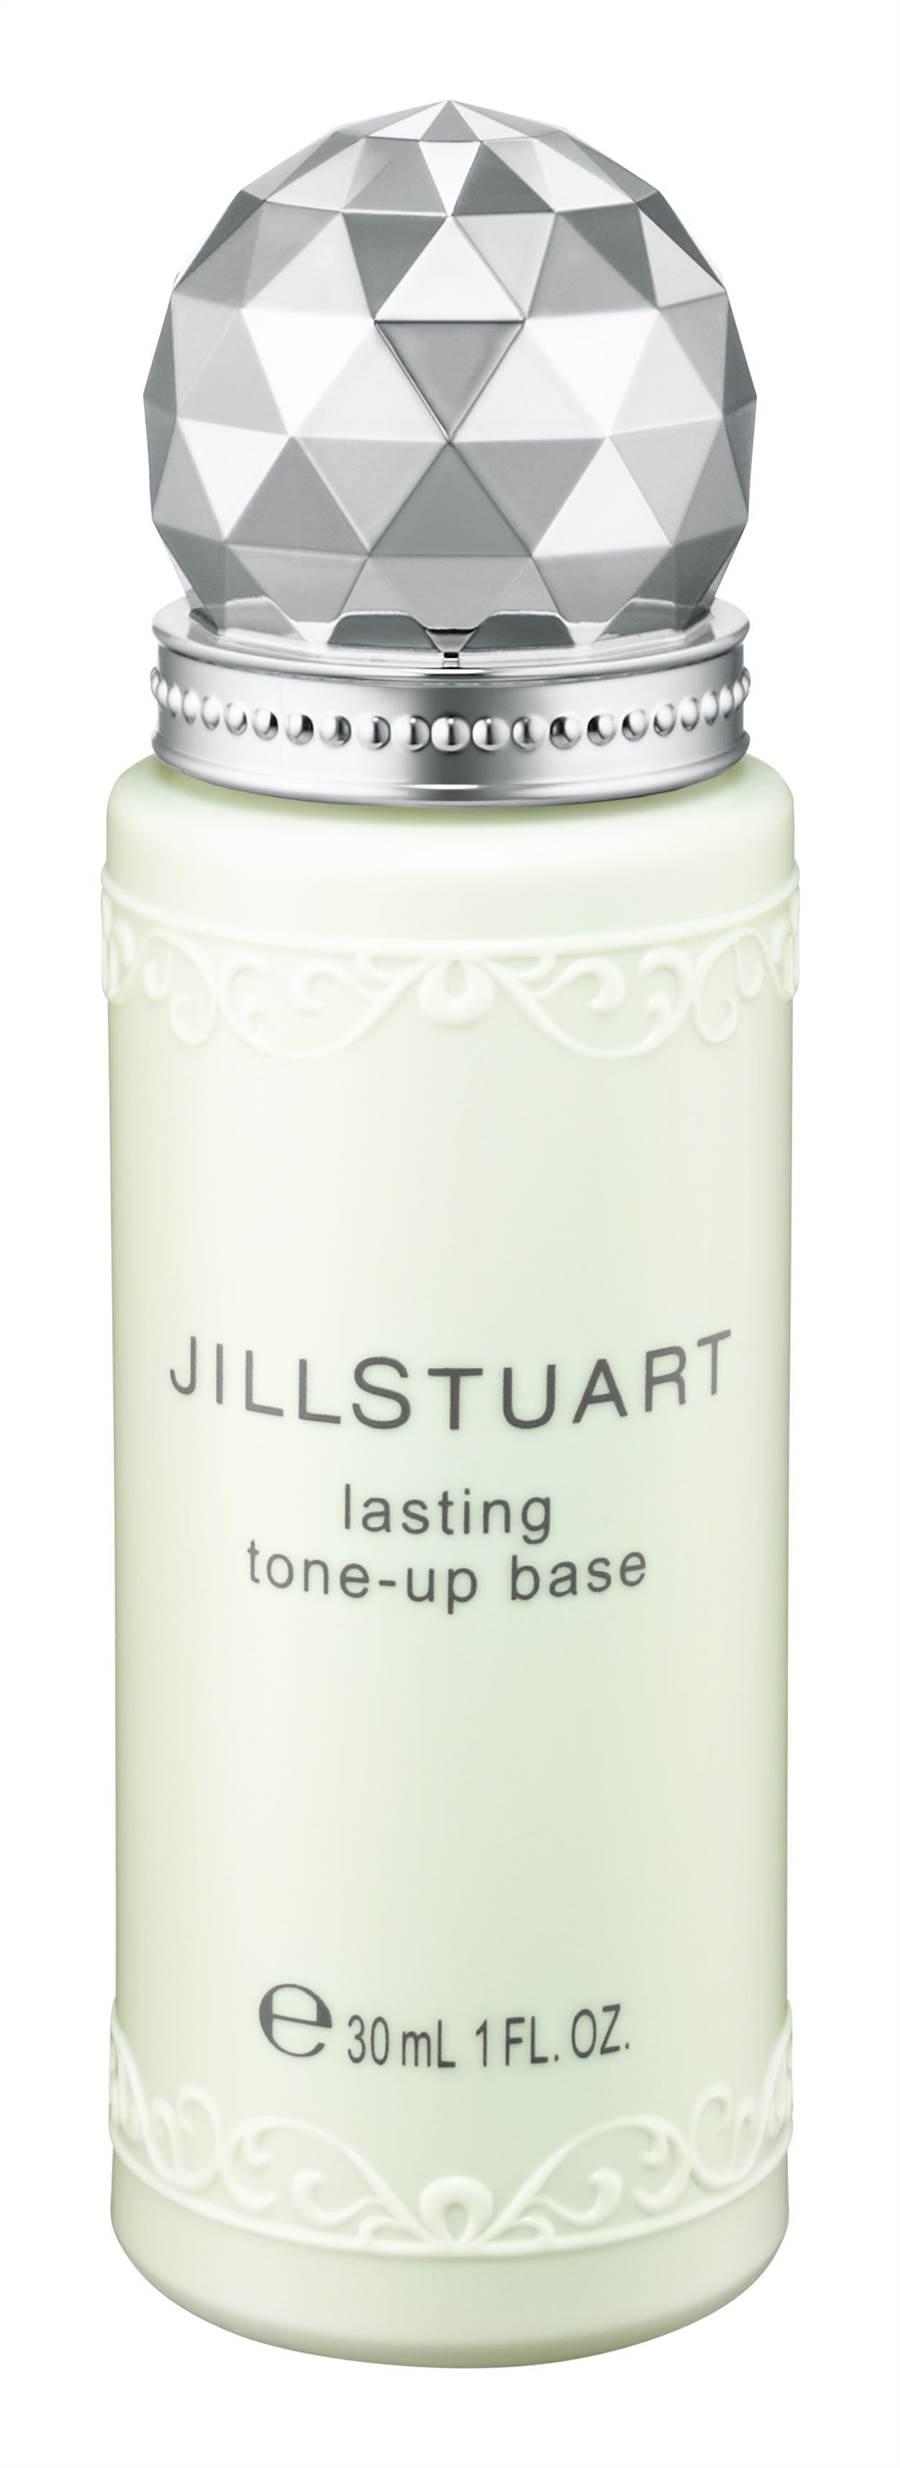 JILL STUART晶透潤色粧前乳(淺綠色),SPF35/PA+++,NT1,150:避免肌膚黯沉打造明亮肌膚。